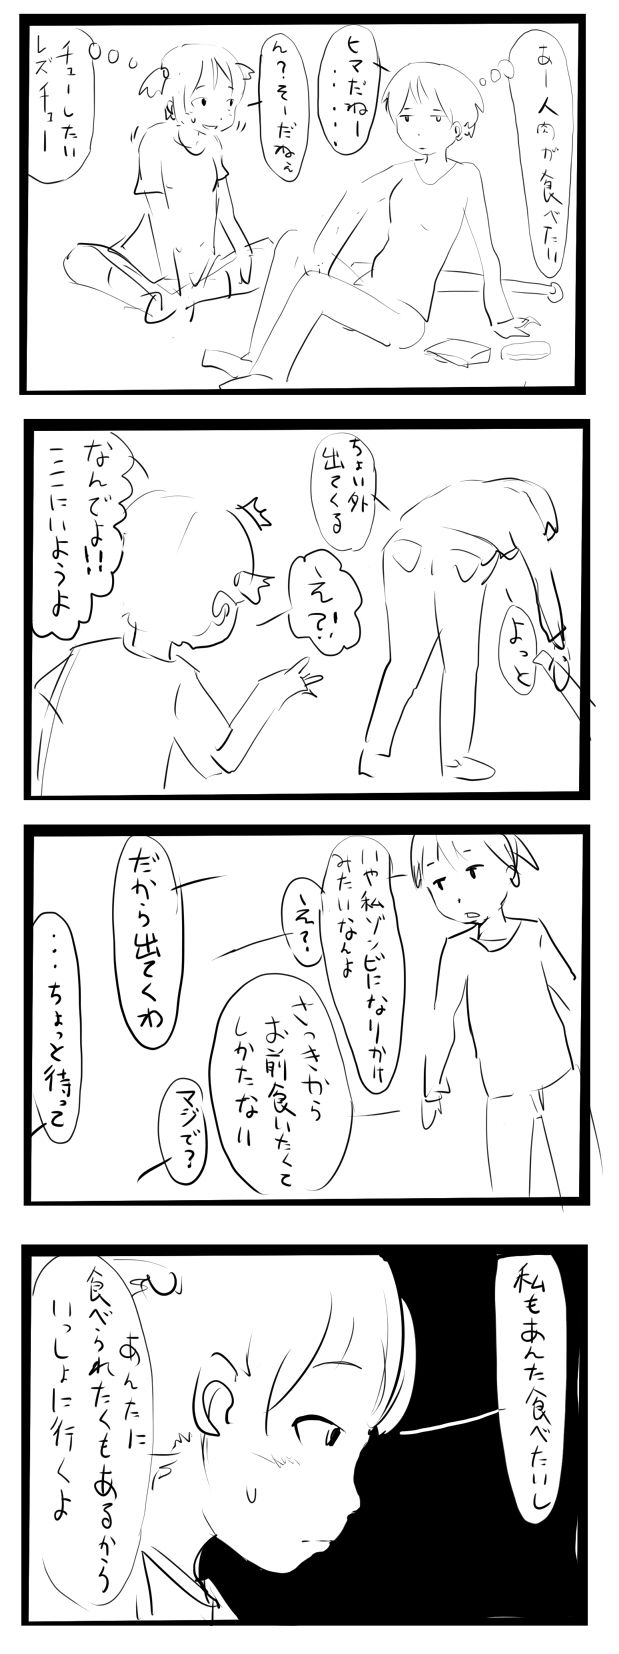 20130630060458_581_1